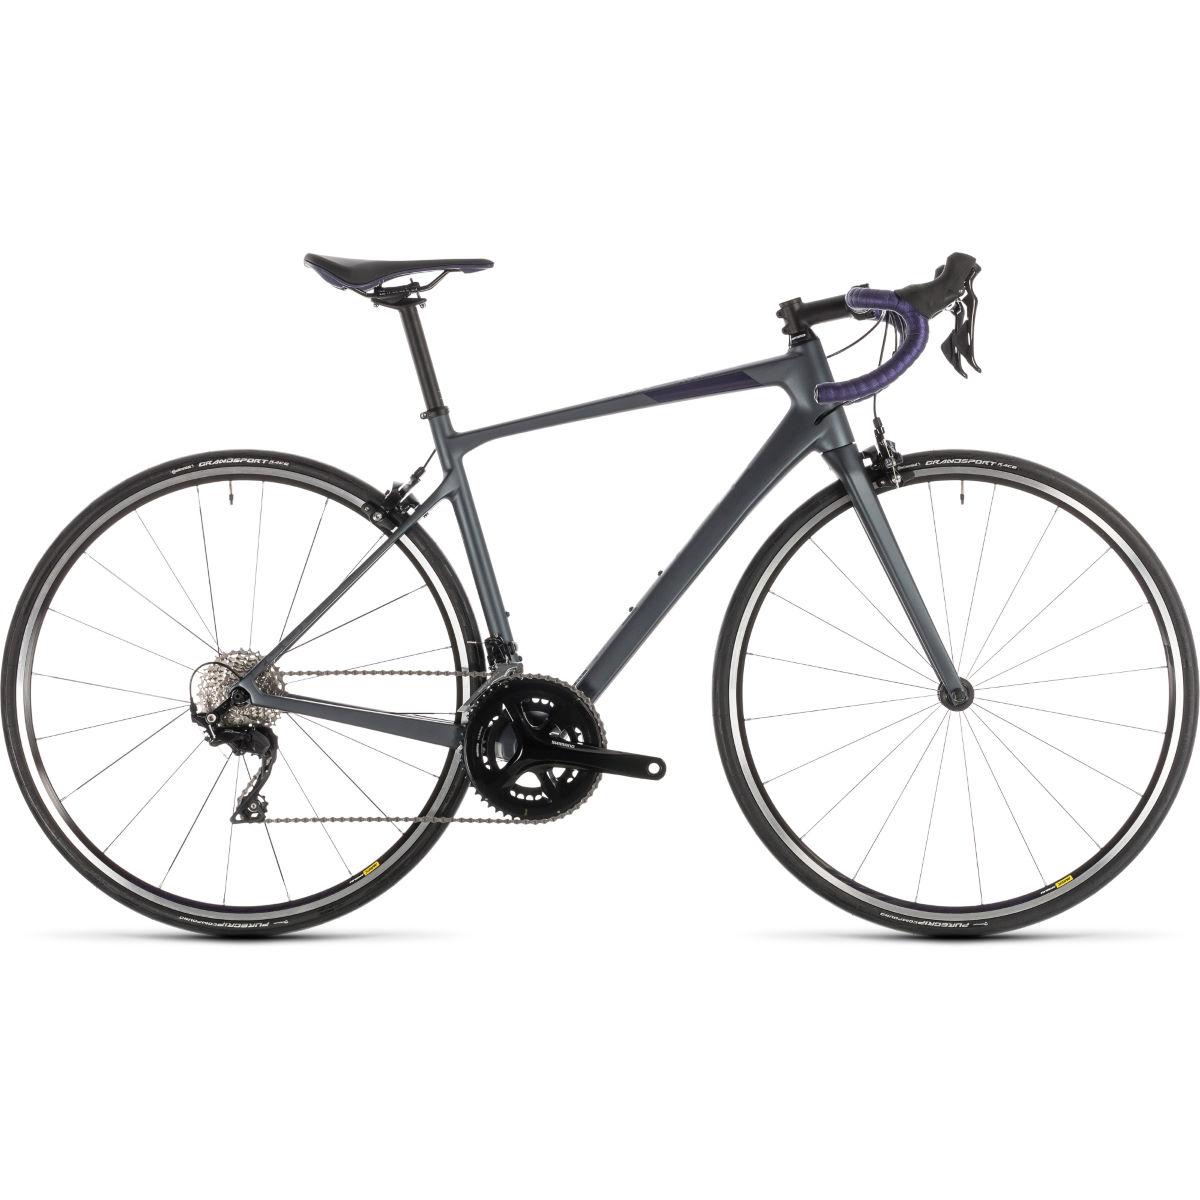 Cube Axial WS GTC Pro 2019 Bikes